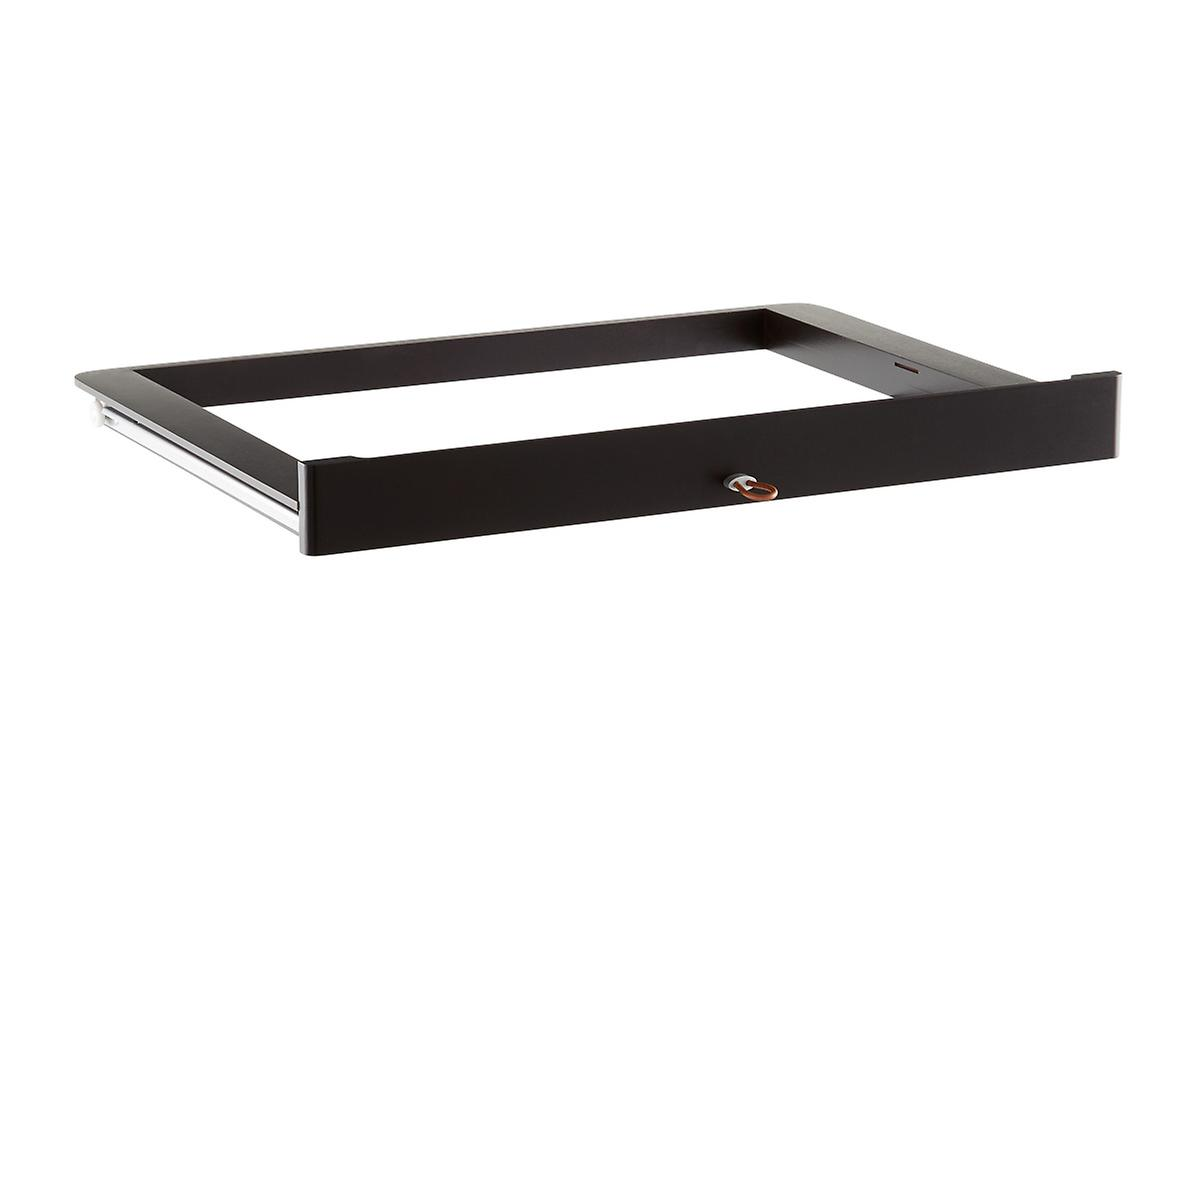 Walnut elfa décor Accessory Tray Drawer Frame & Front